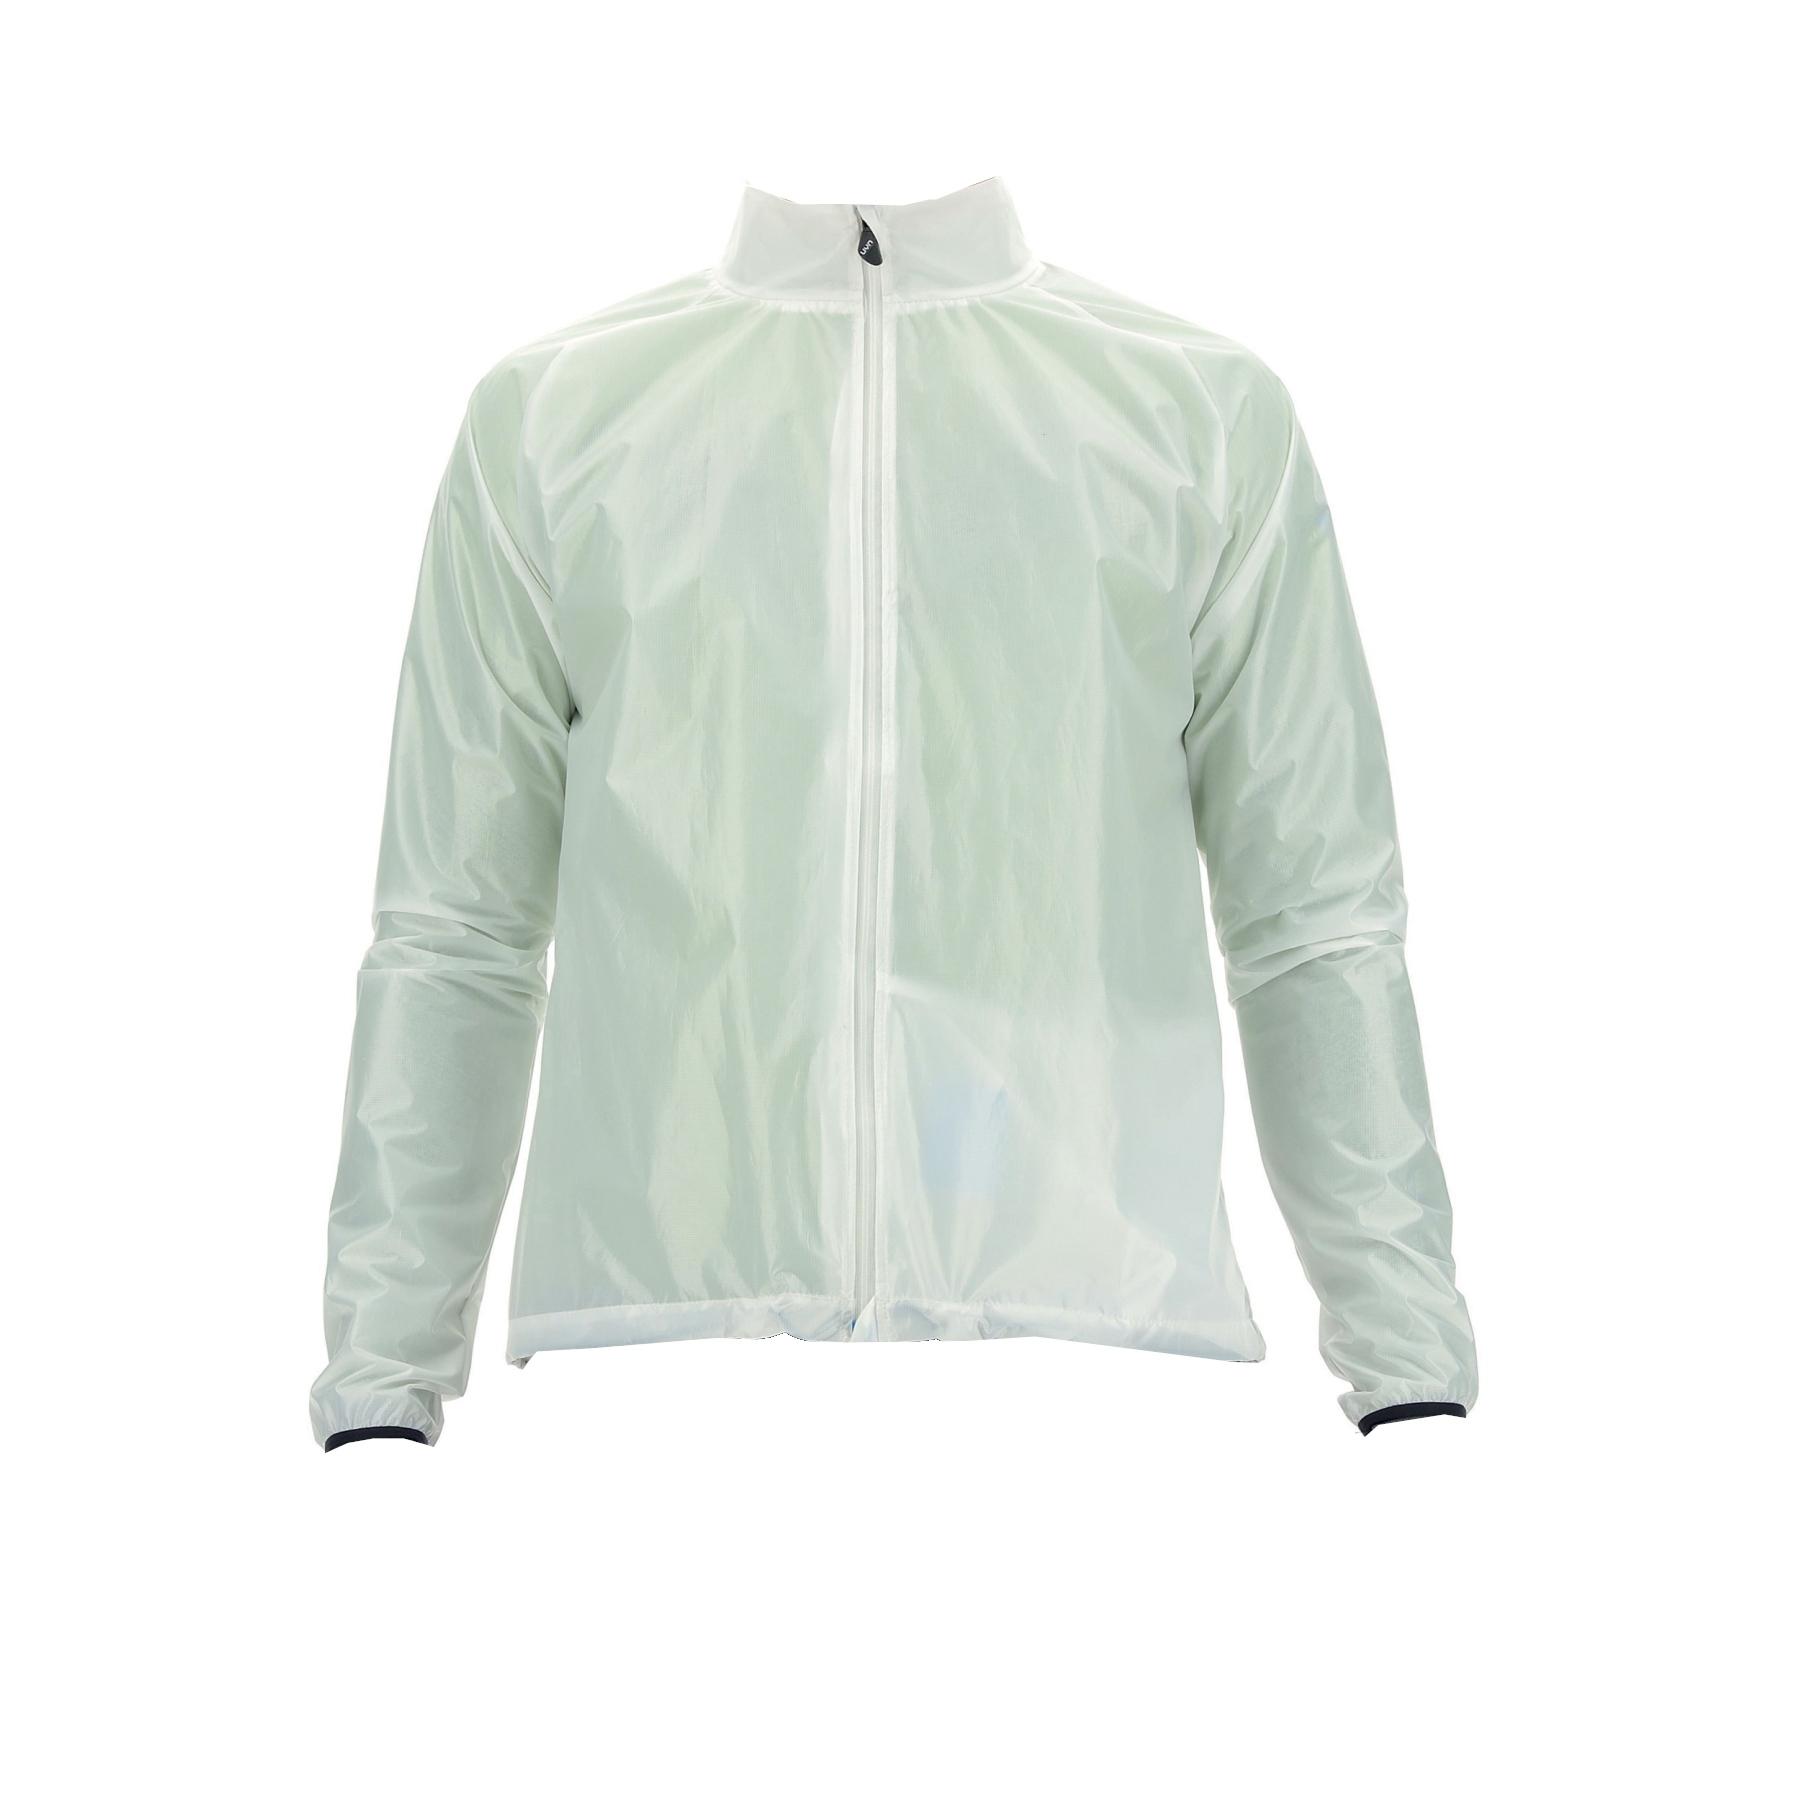 UYN Running Luminance Regular Fit Jacke - Off White Plum/Black